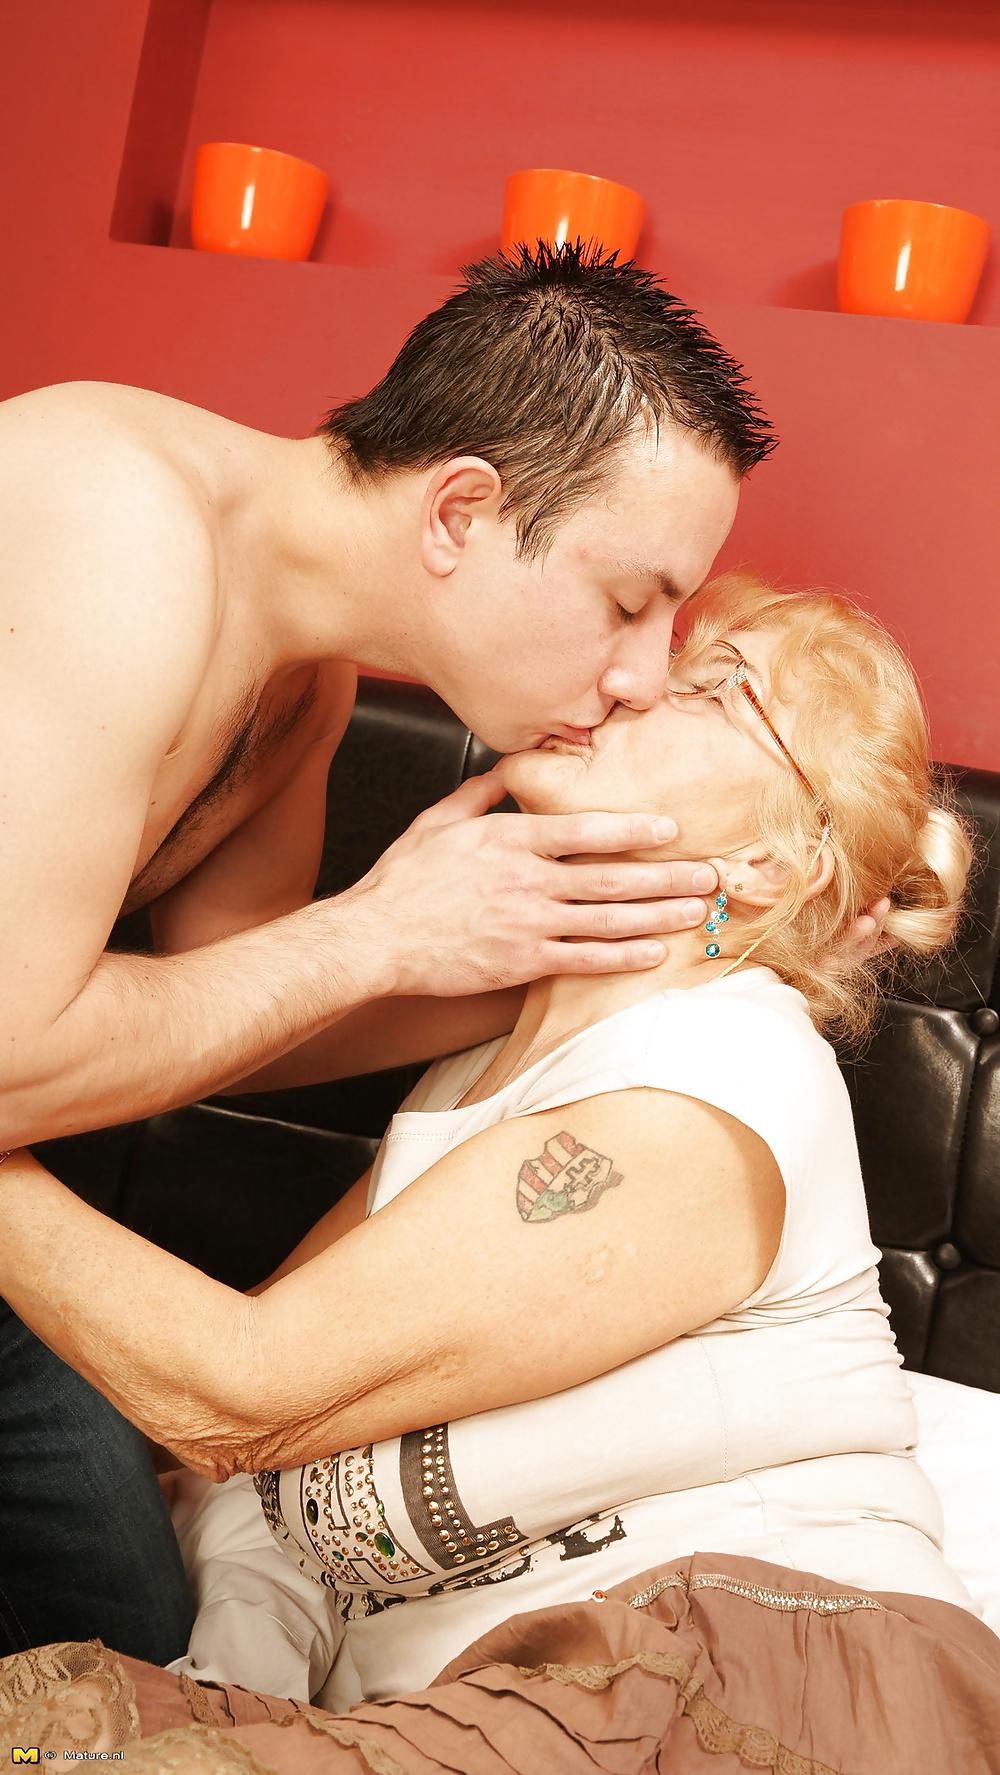 mature-women-kissing-younger-men-dead-porn-actresses